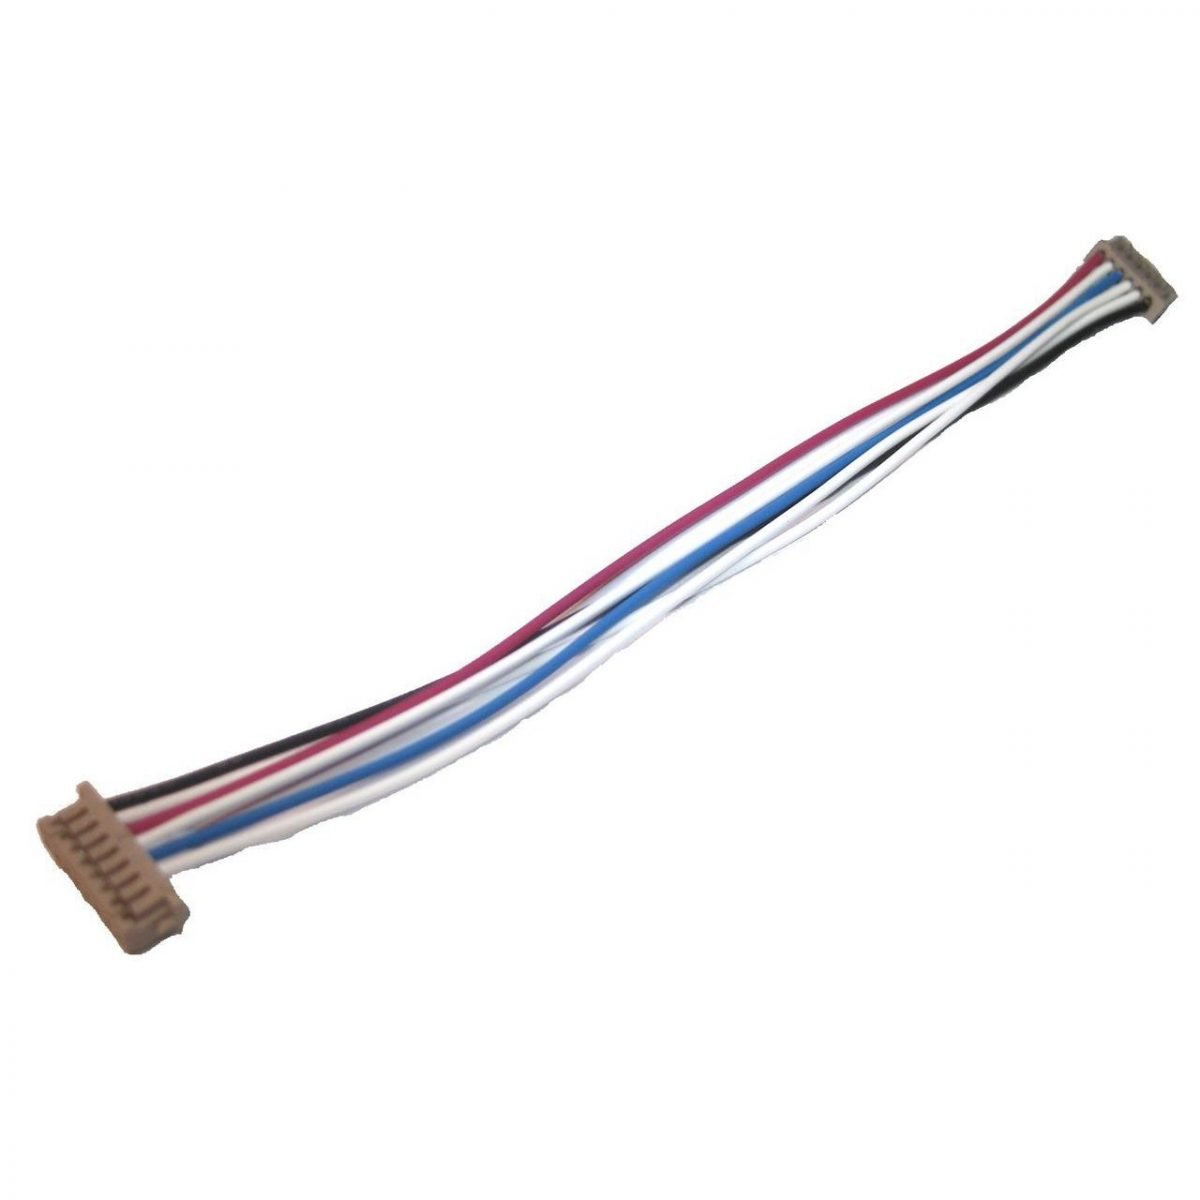 RFD900u Connector Cables